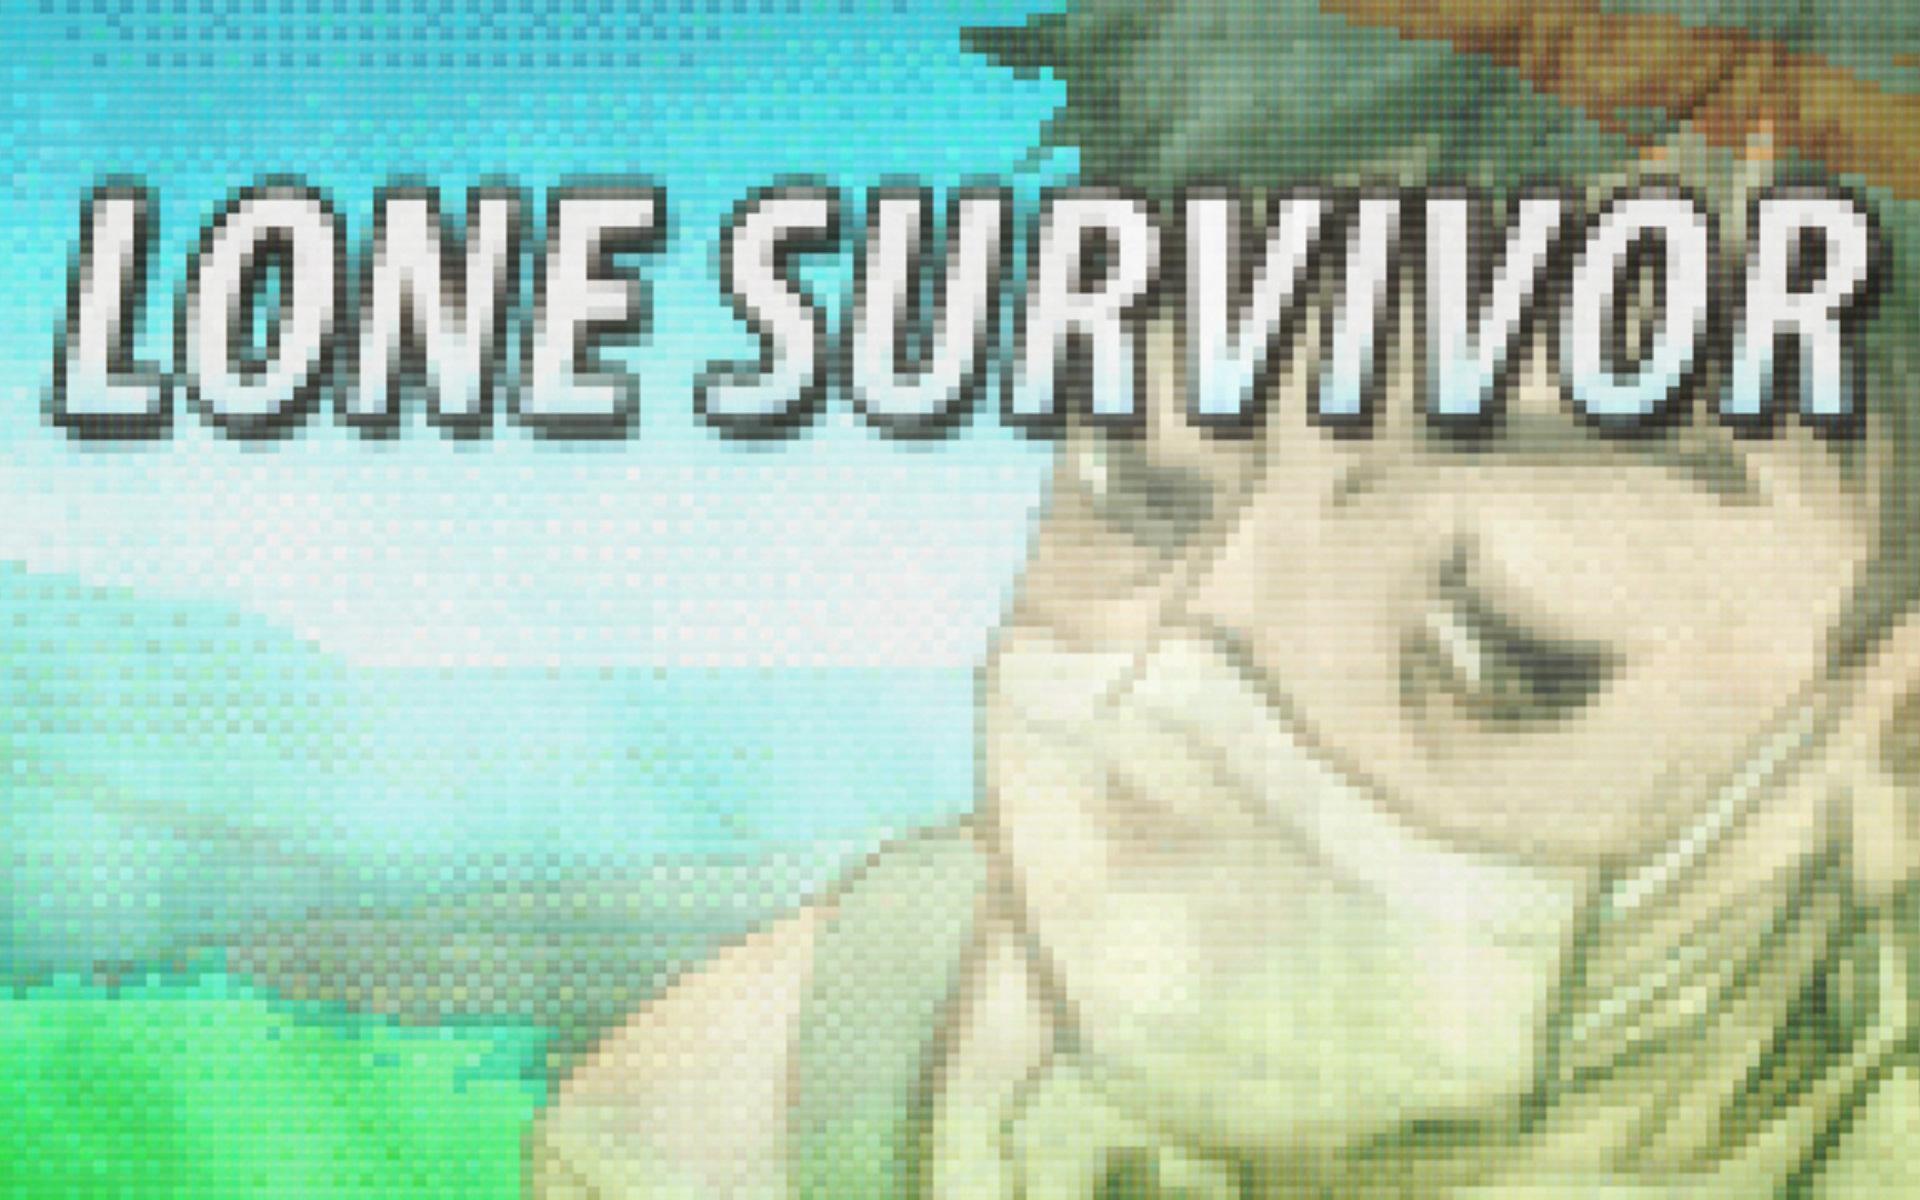 Free Lone Survivor Wallpaper in 1920x1200